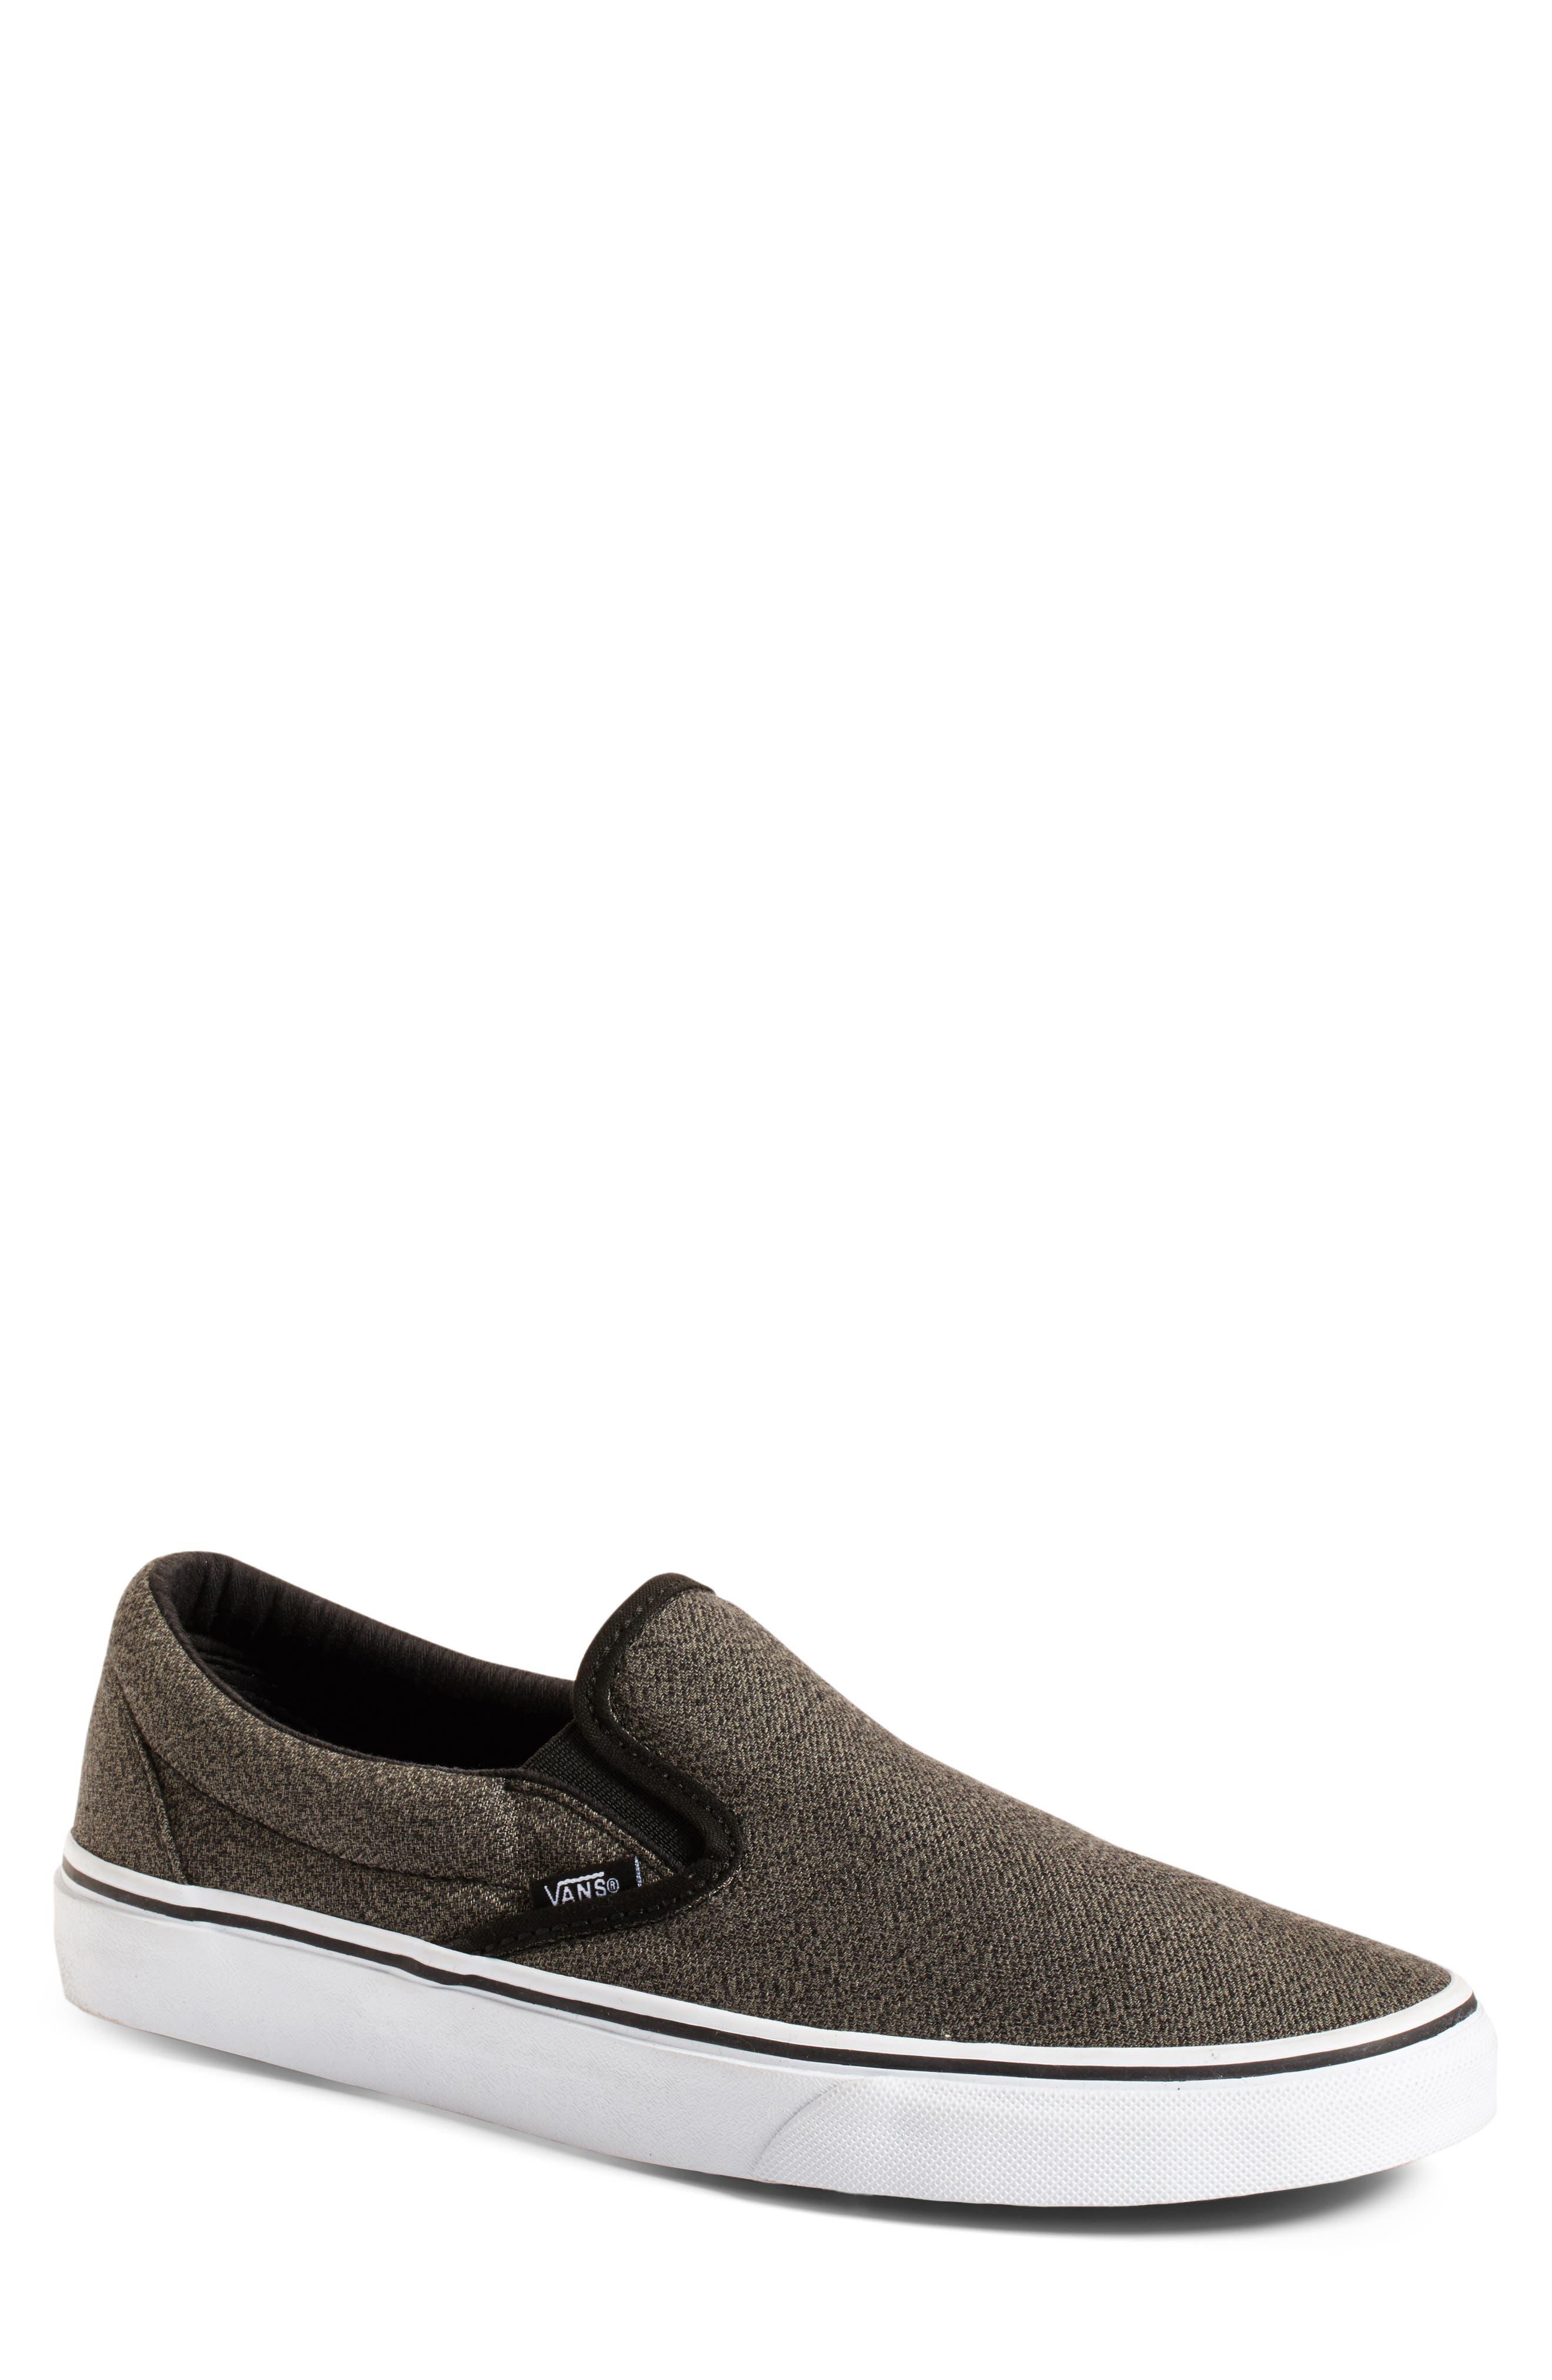 'Classic' Slip-On Sneaker,                         Main,                         color, Black/ True White